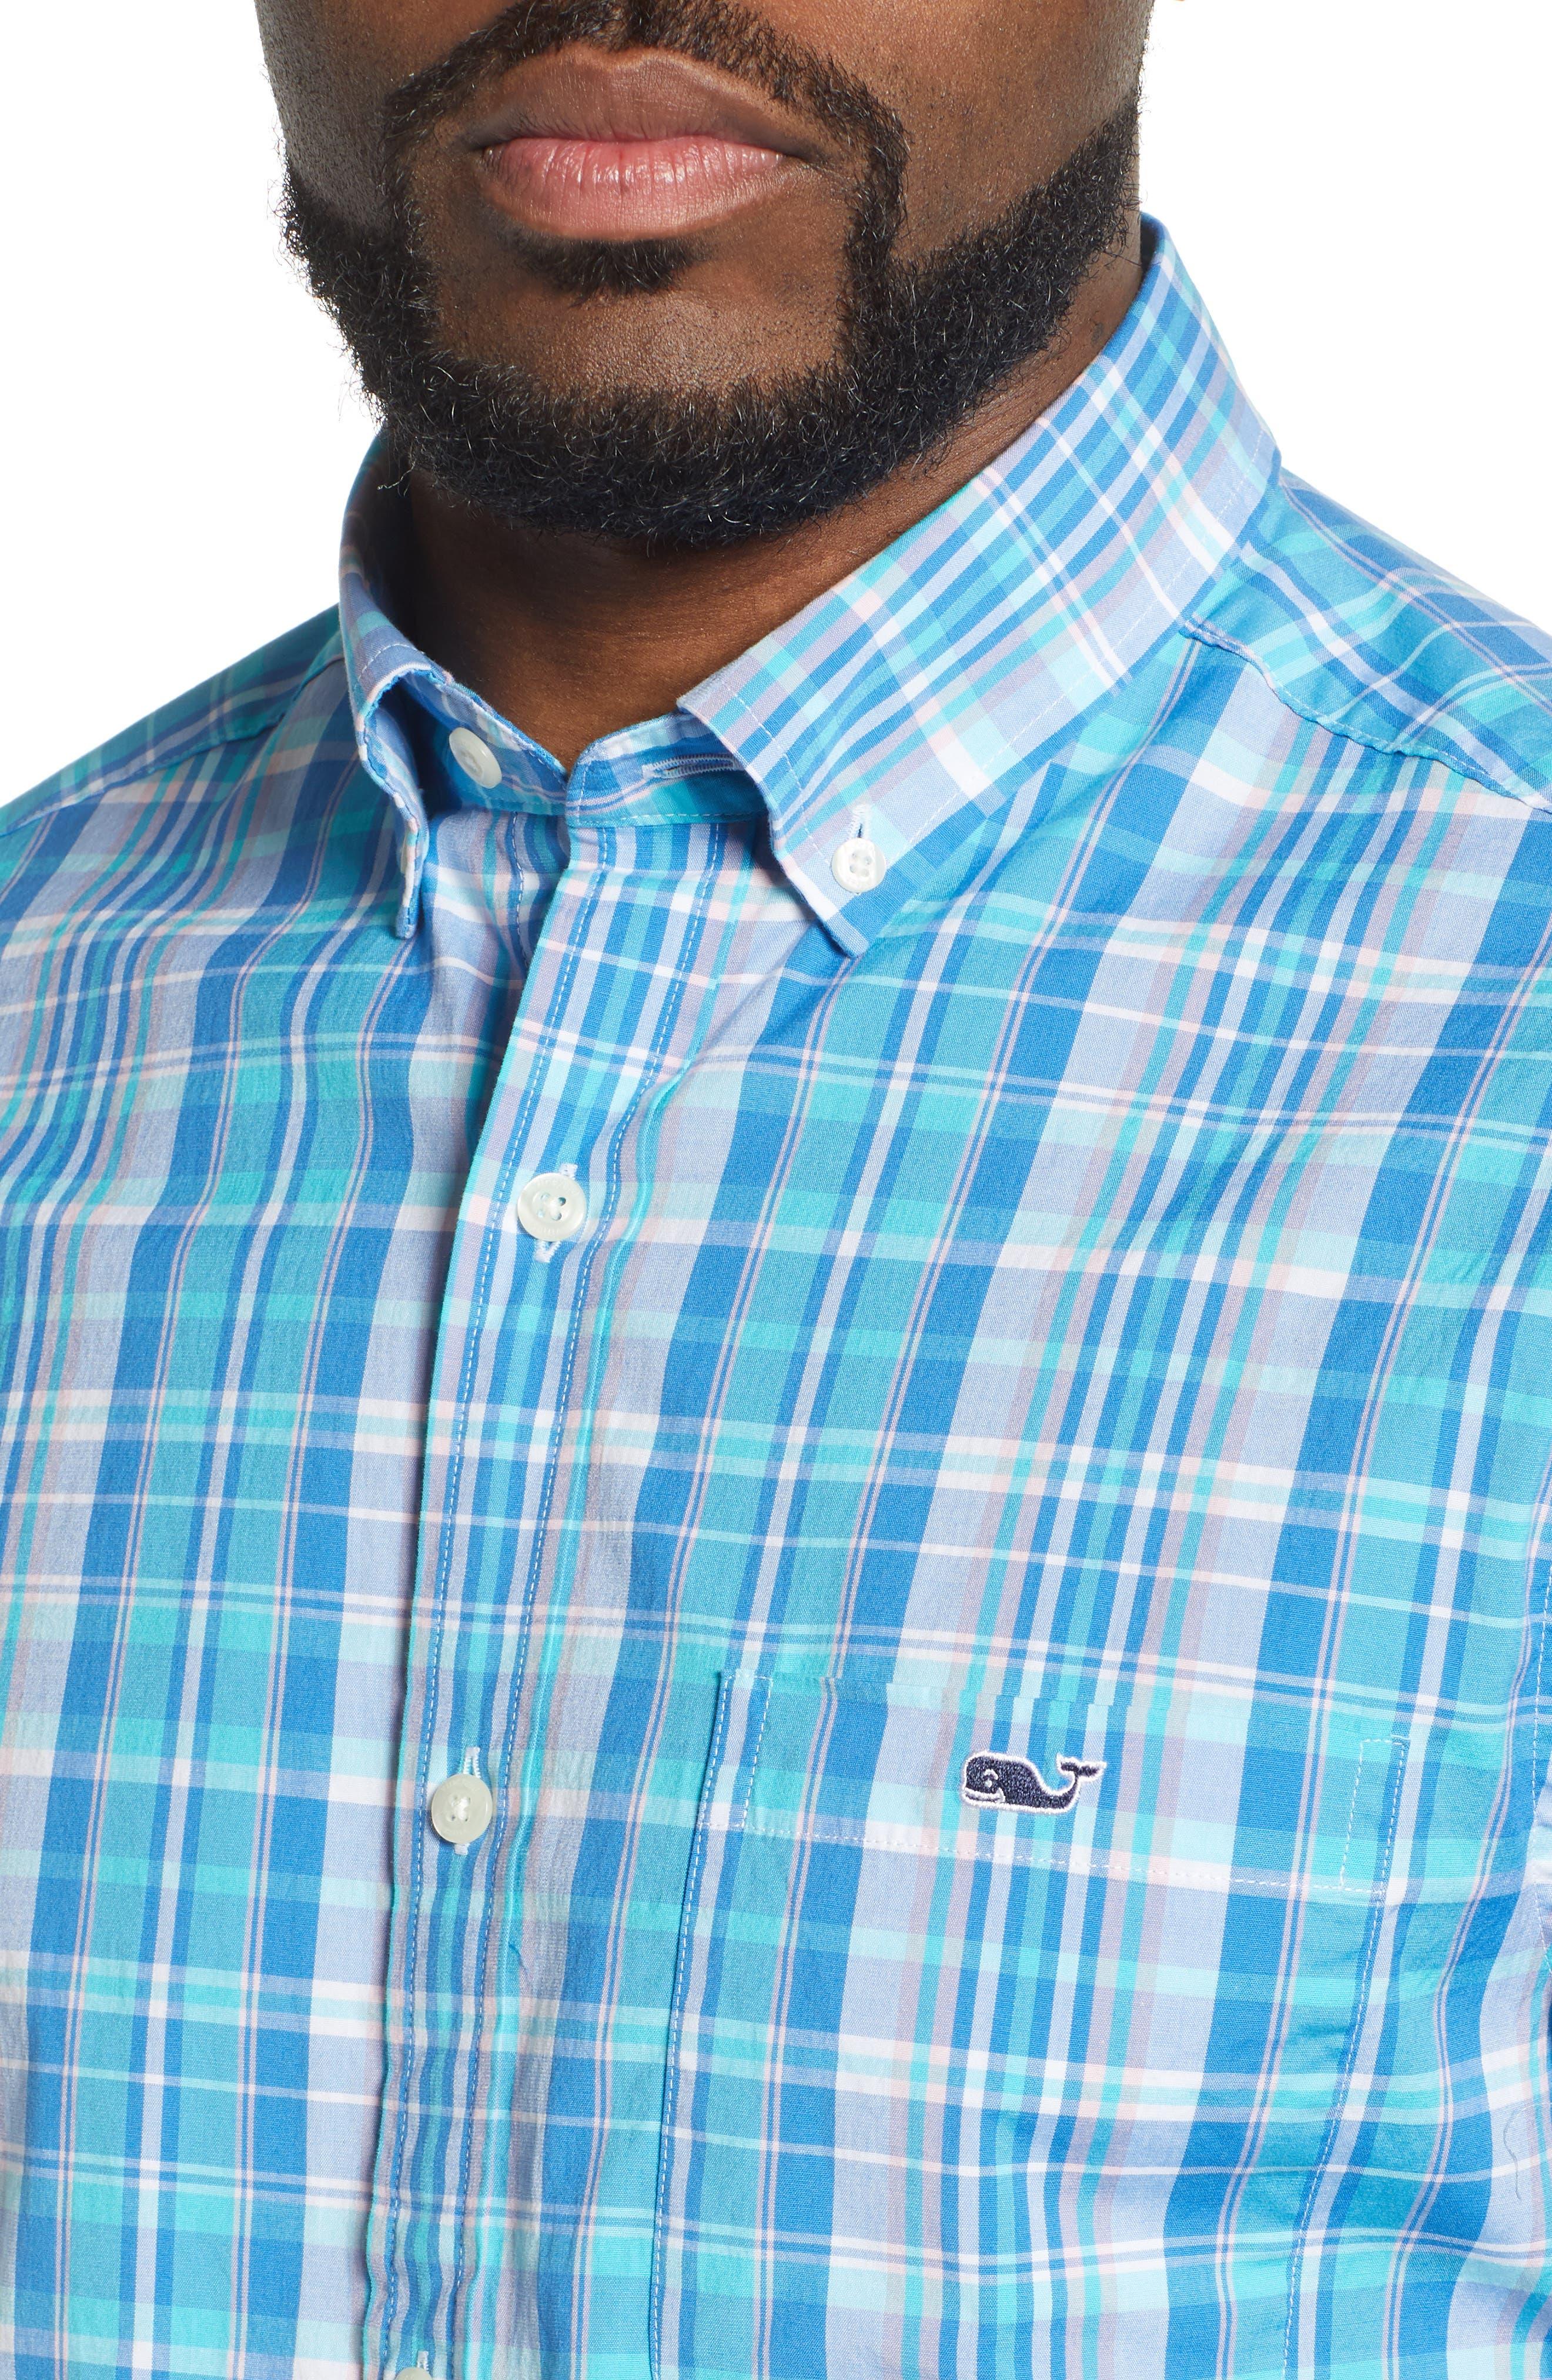 VINEYARD VINES, Tucker Regular Fit Plaid Sport Shirt, Alternate thumbnail 2, color, JAKE BLUE